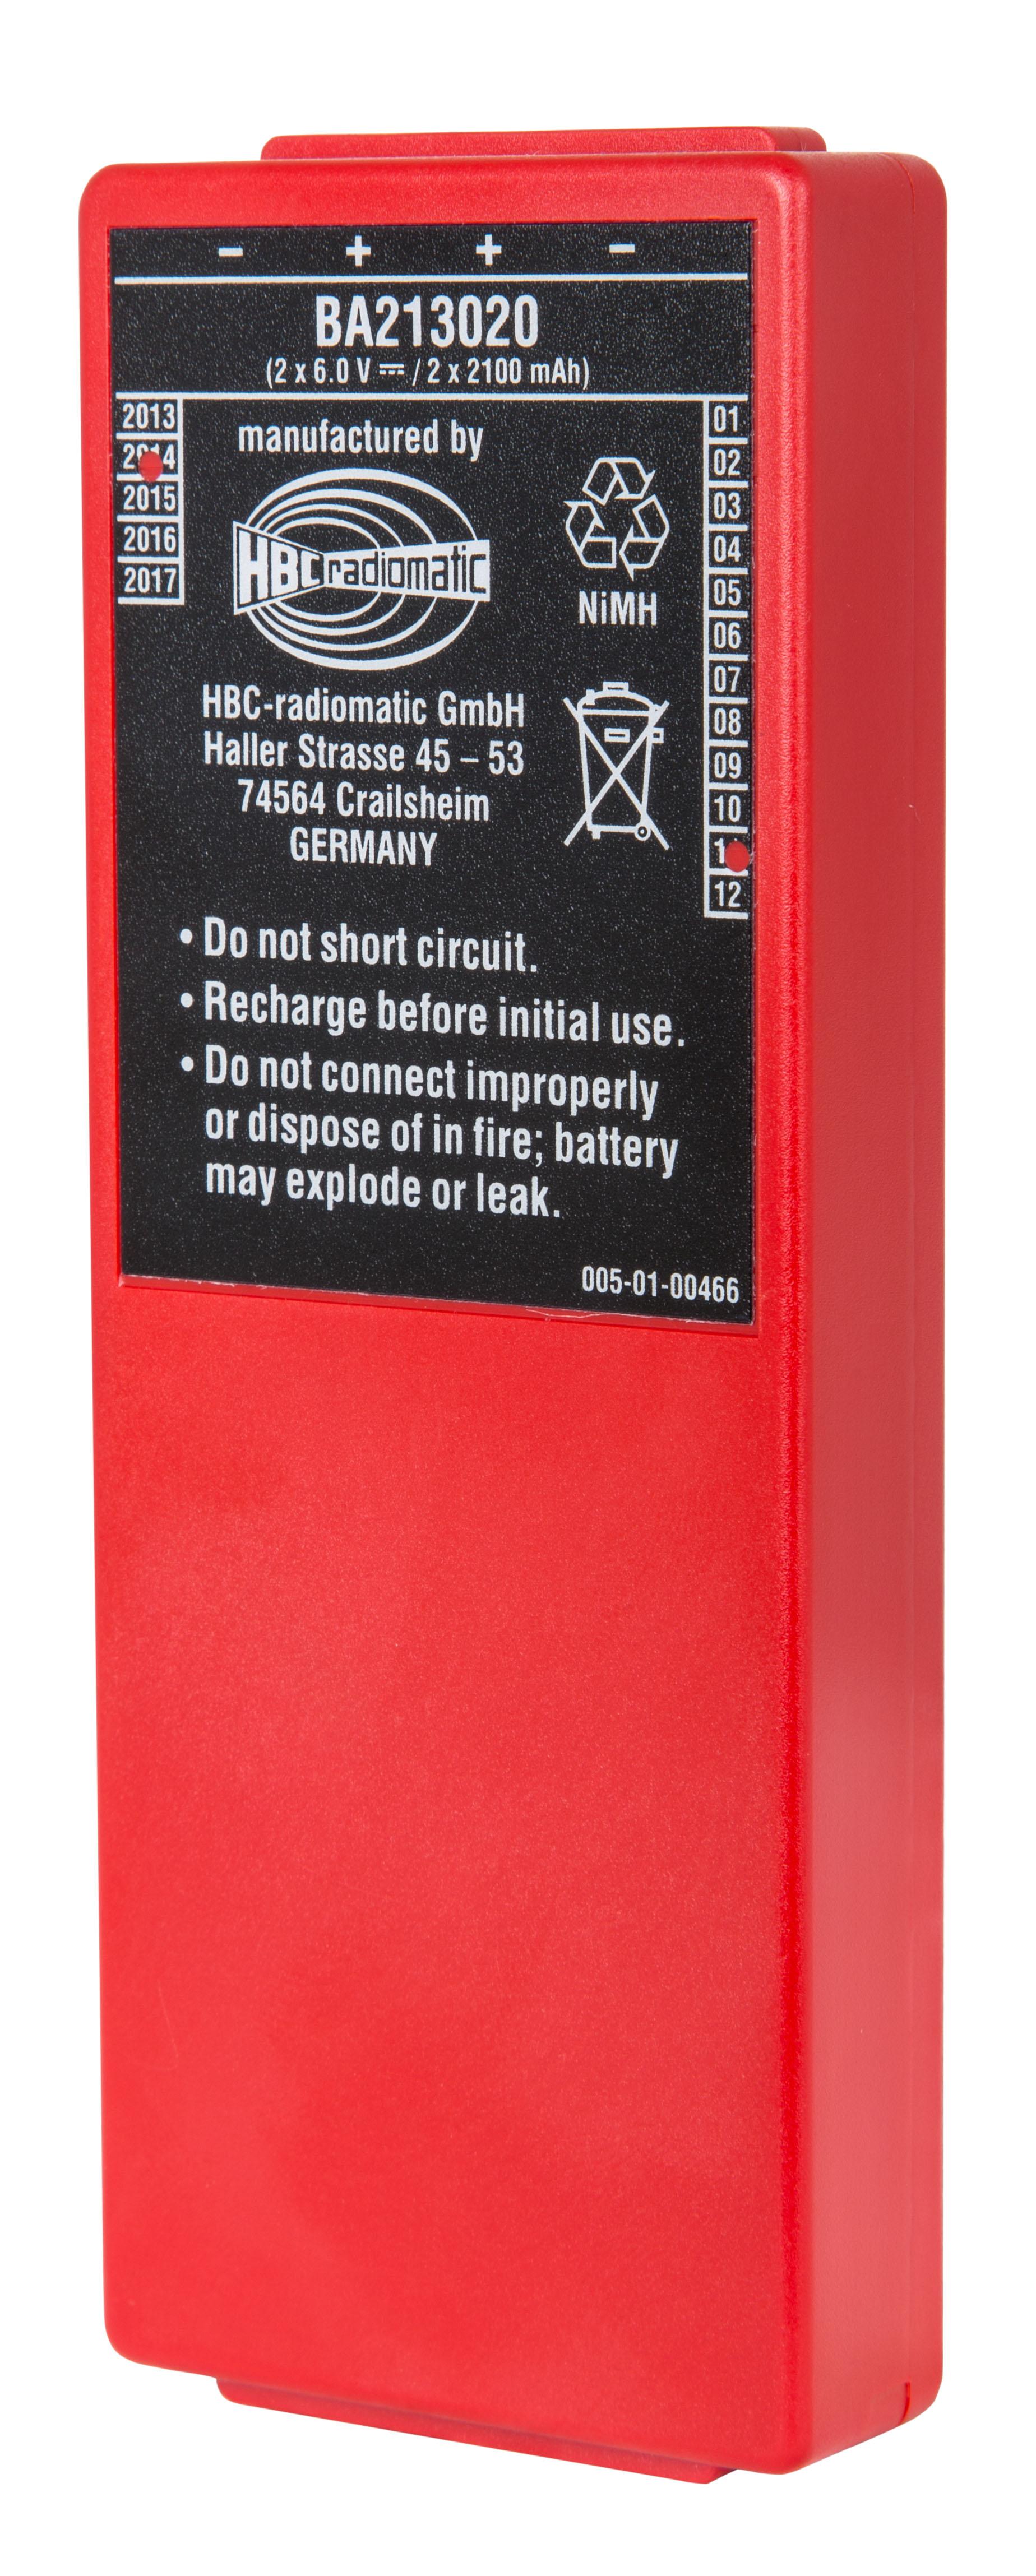 BA213030 Battery - CTS